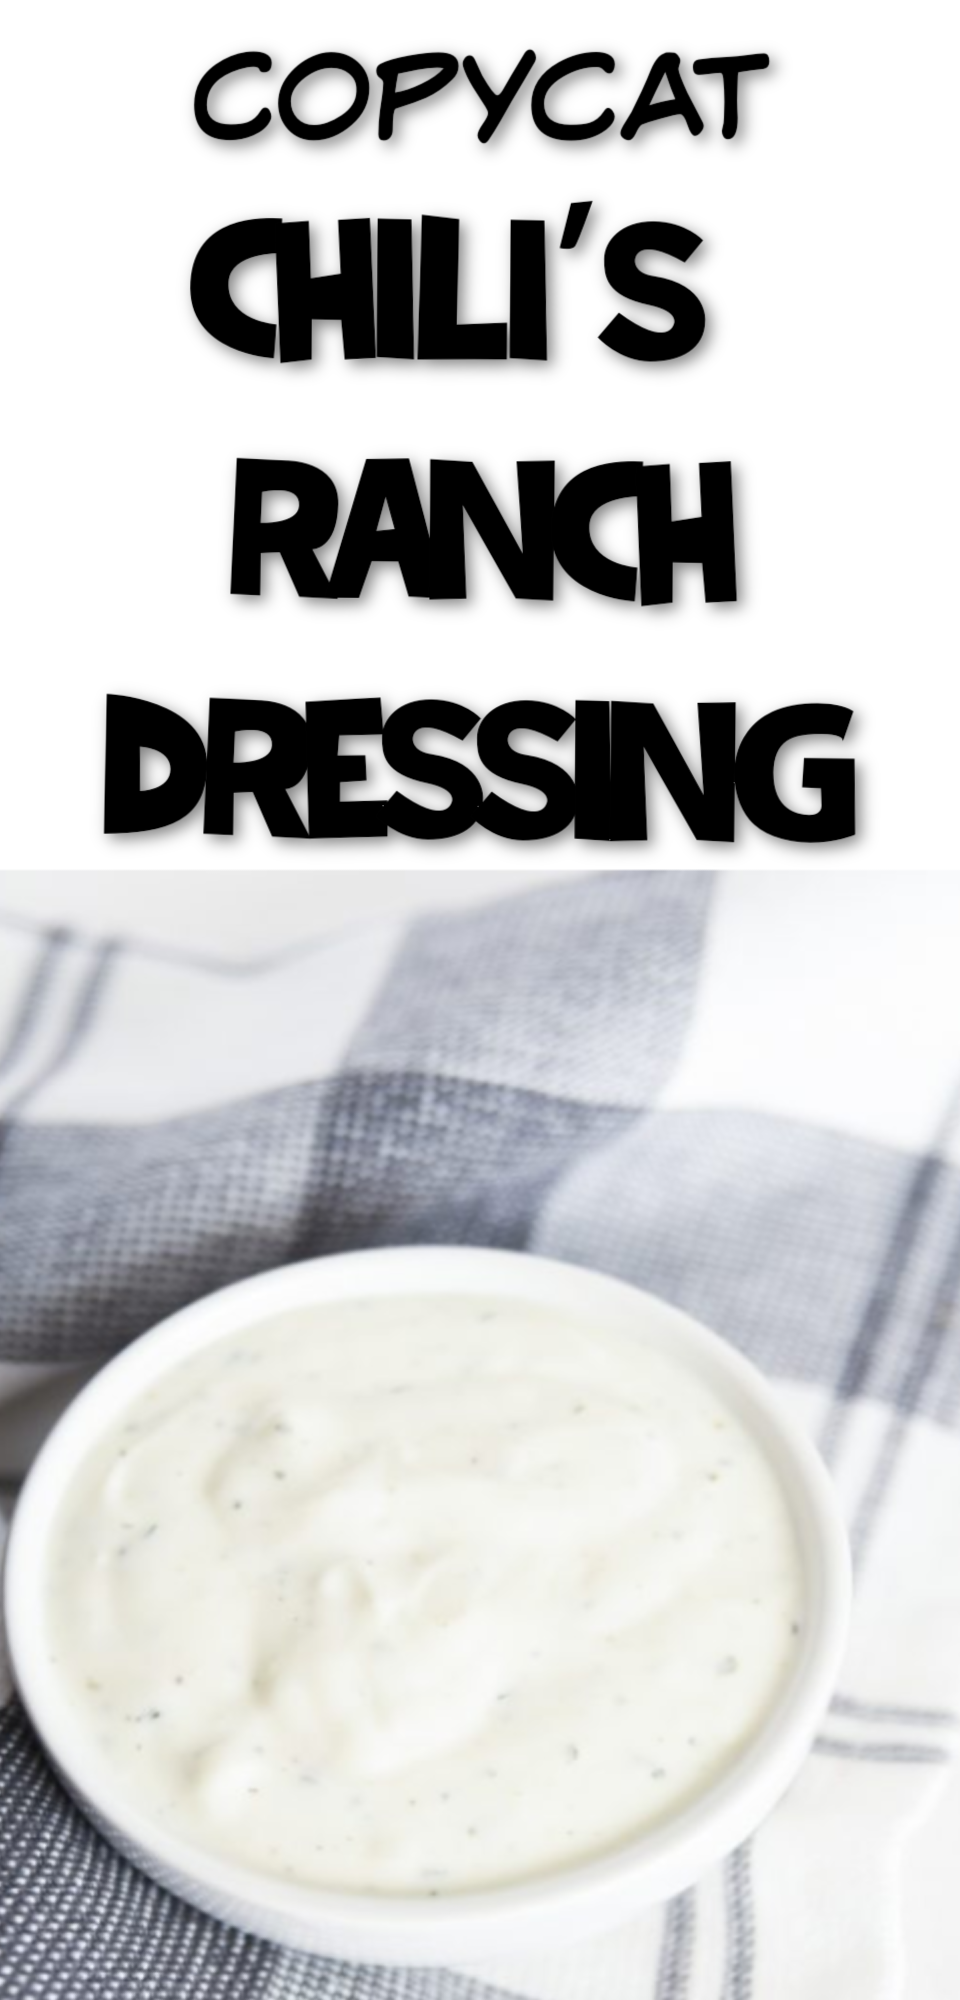 Copycat Chili's Ranch Dressing Recipe via @simplysidedishes89